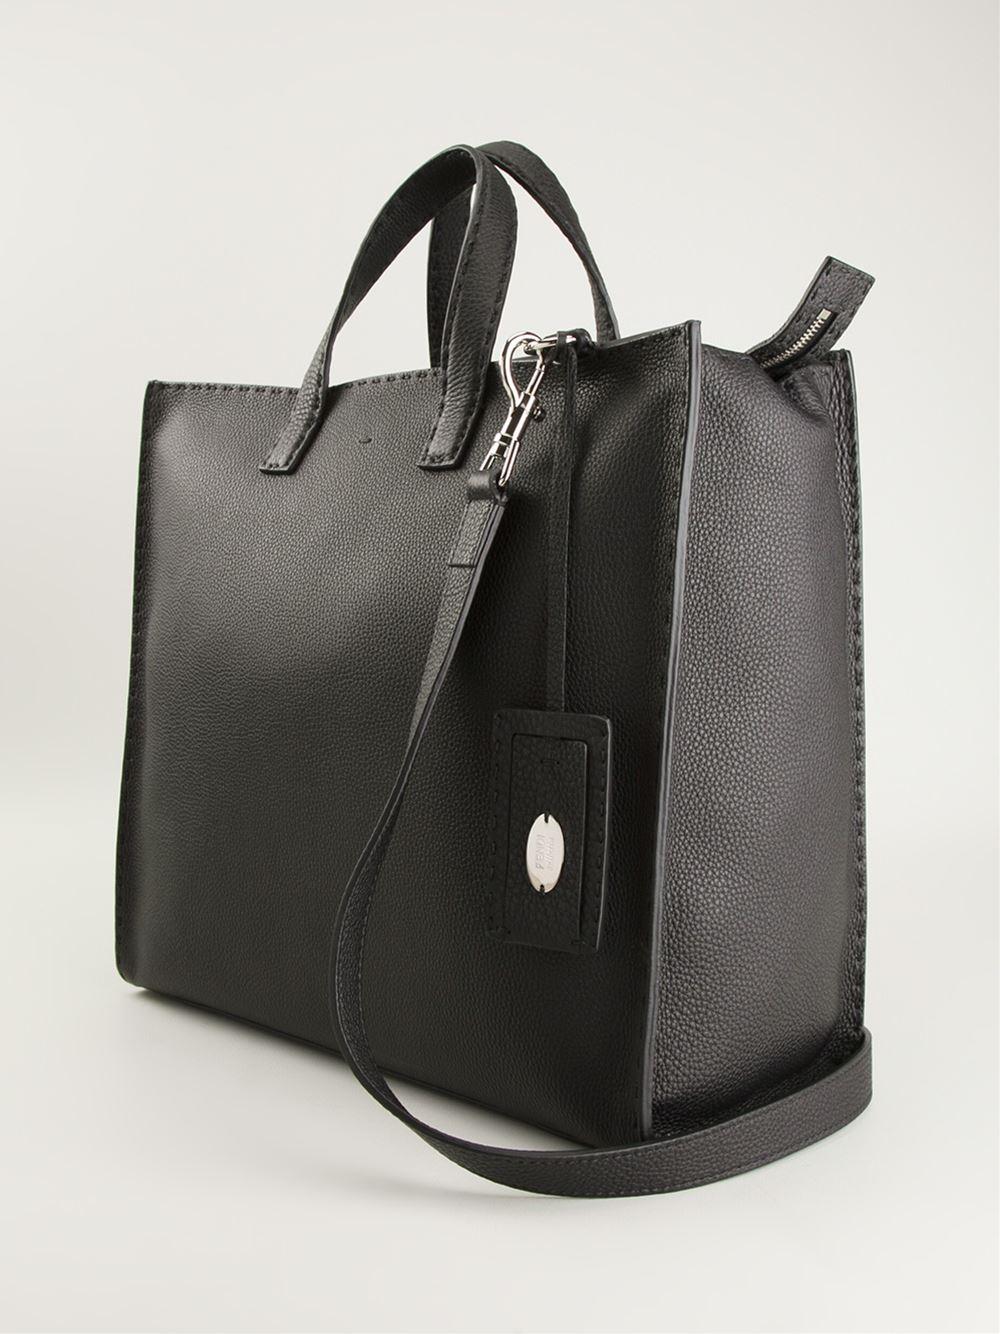 dd000c764162 coupon code for fendi selleria medium leather tote tote bags 502731239  be39c 6135b  low cost lyst fendi selleria tote in black for men 2494d f77eb